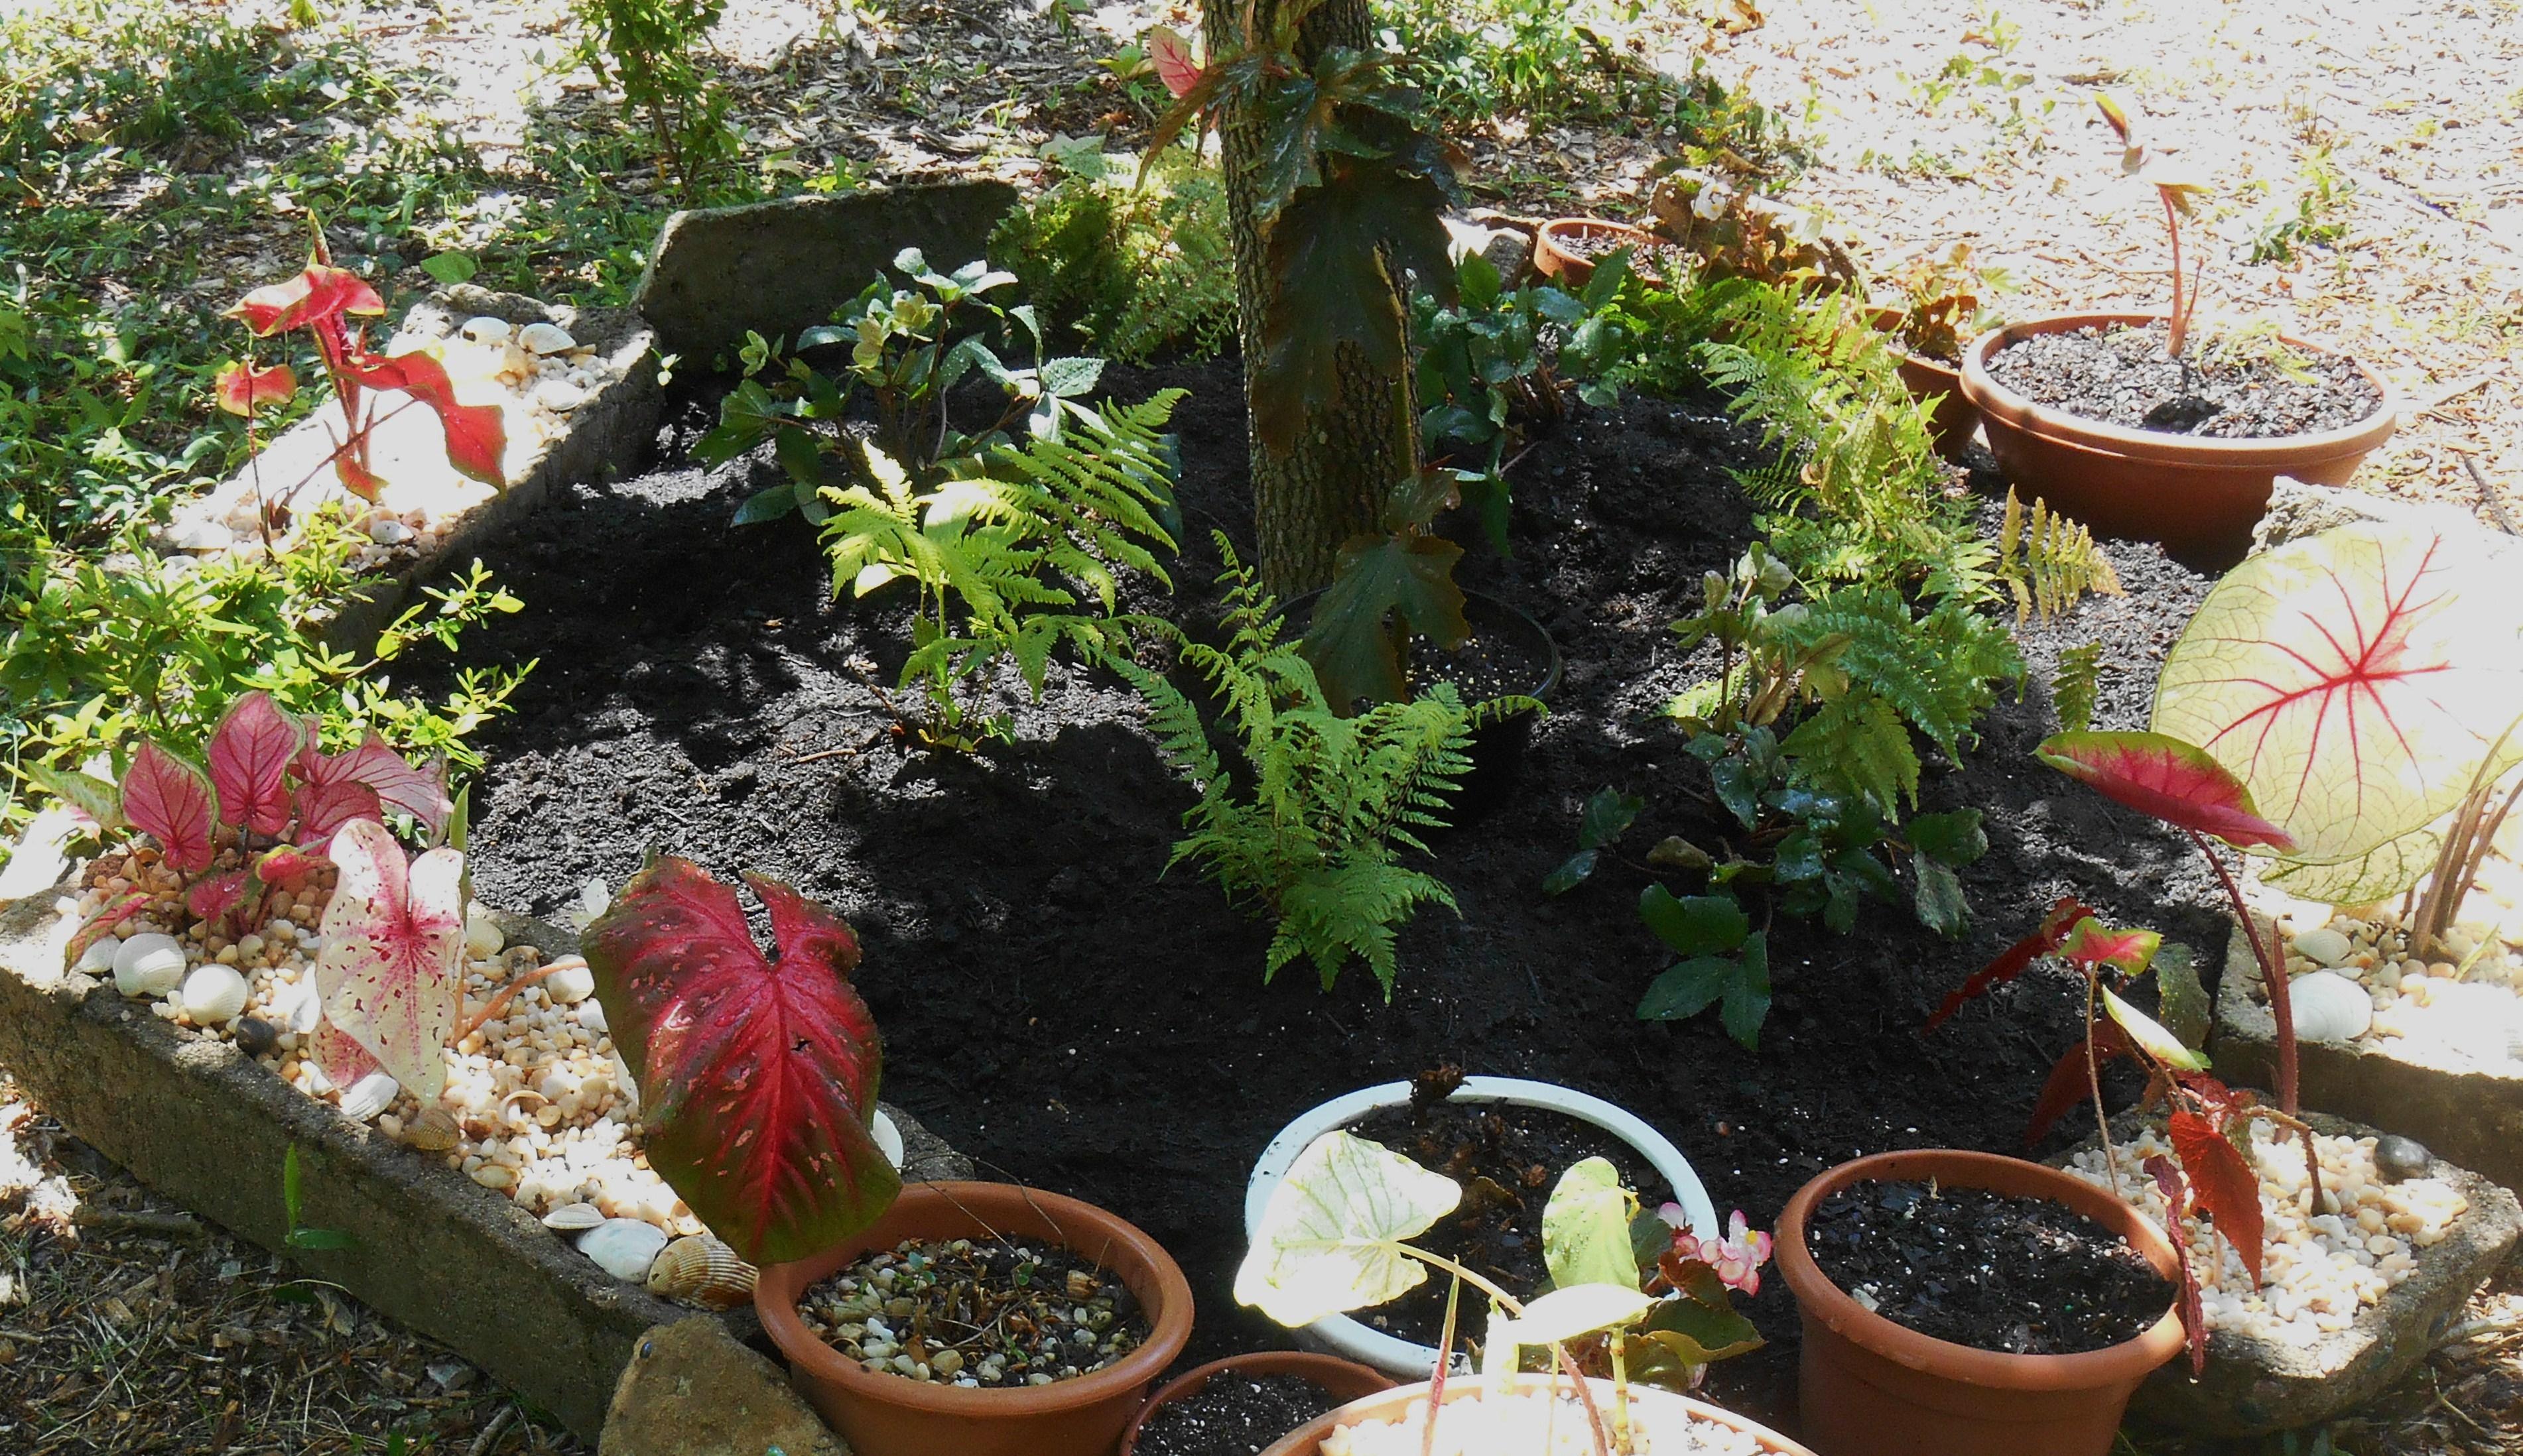 May 19, 2014 new raised bed fern garden 002